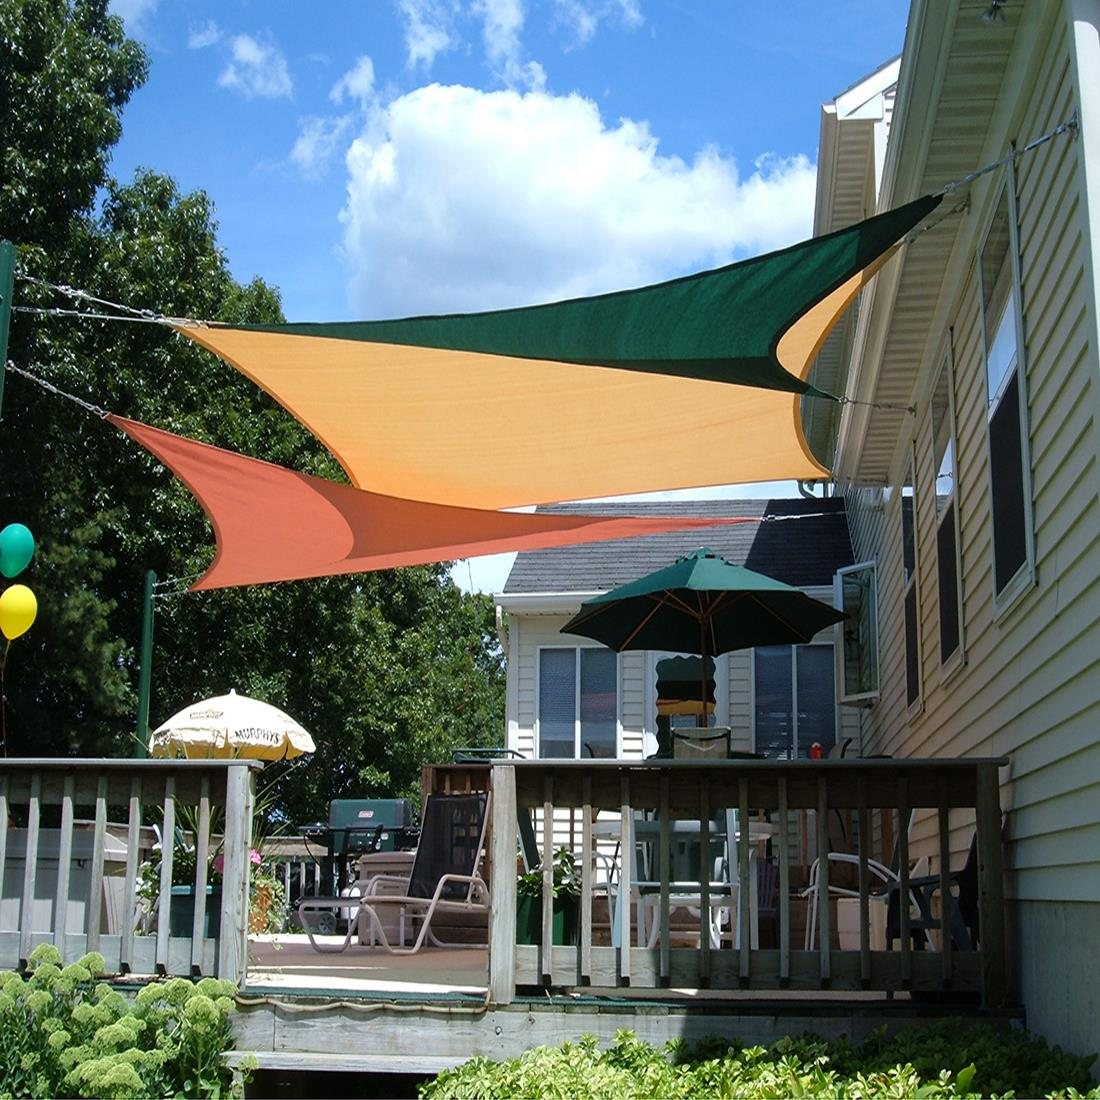 Backyard Patio Diy: Quictent 12/18/20 FT Triangle Sun Shade Sail Patio Pool